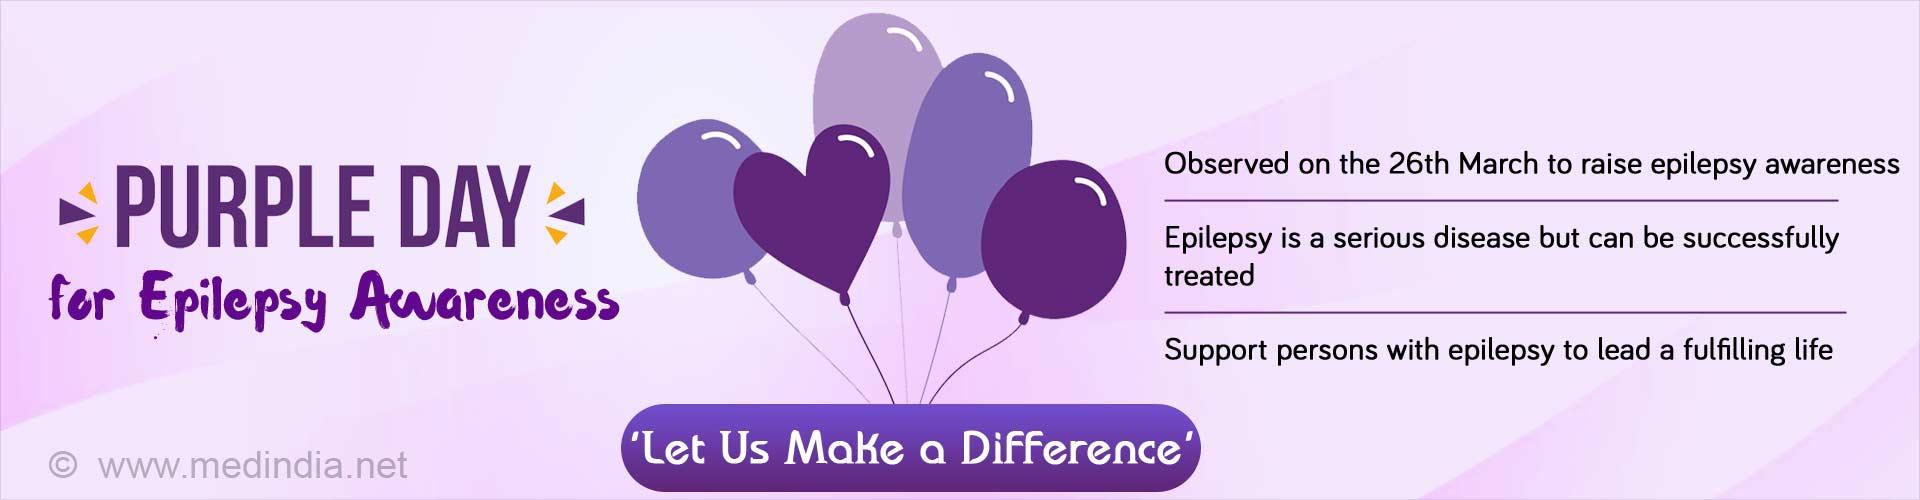 Purple Day – Get Involved in Raising Epilepsy Awareness